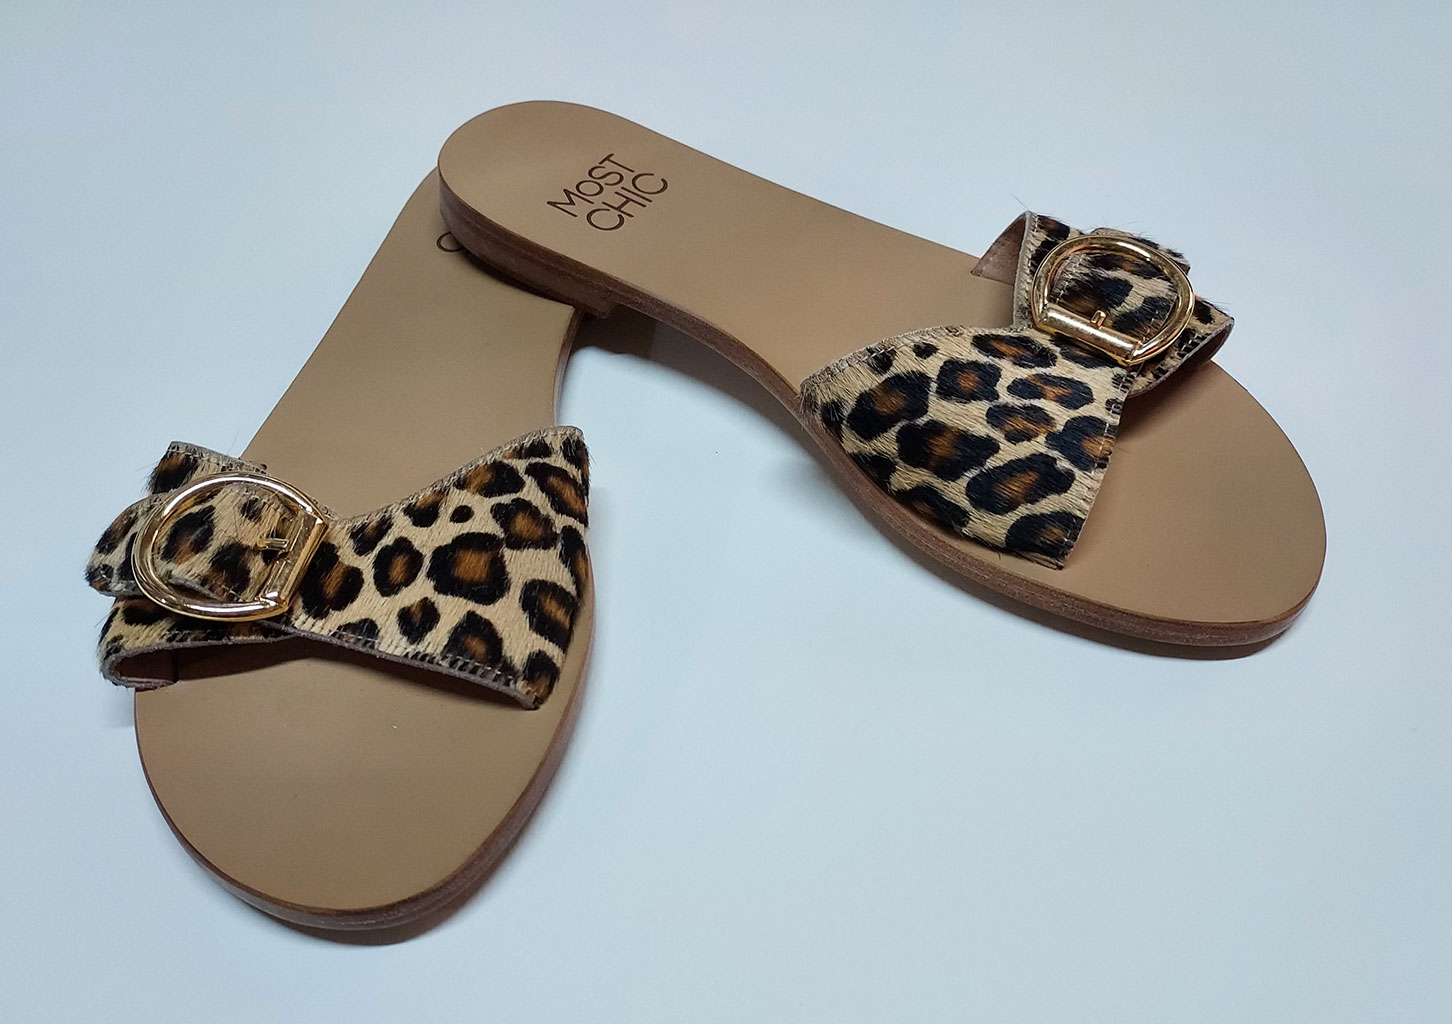 MOST CHIC Sandals Scarlet star (leopard)